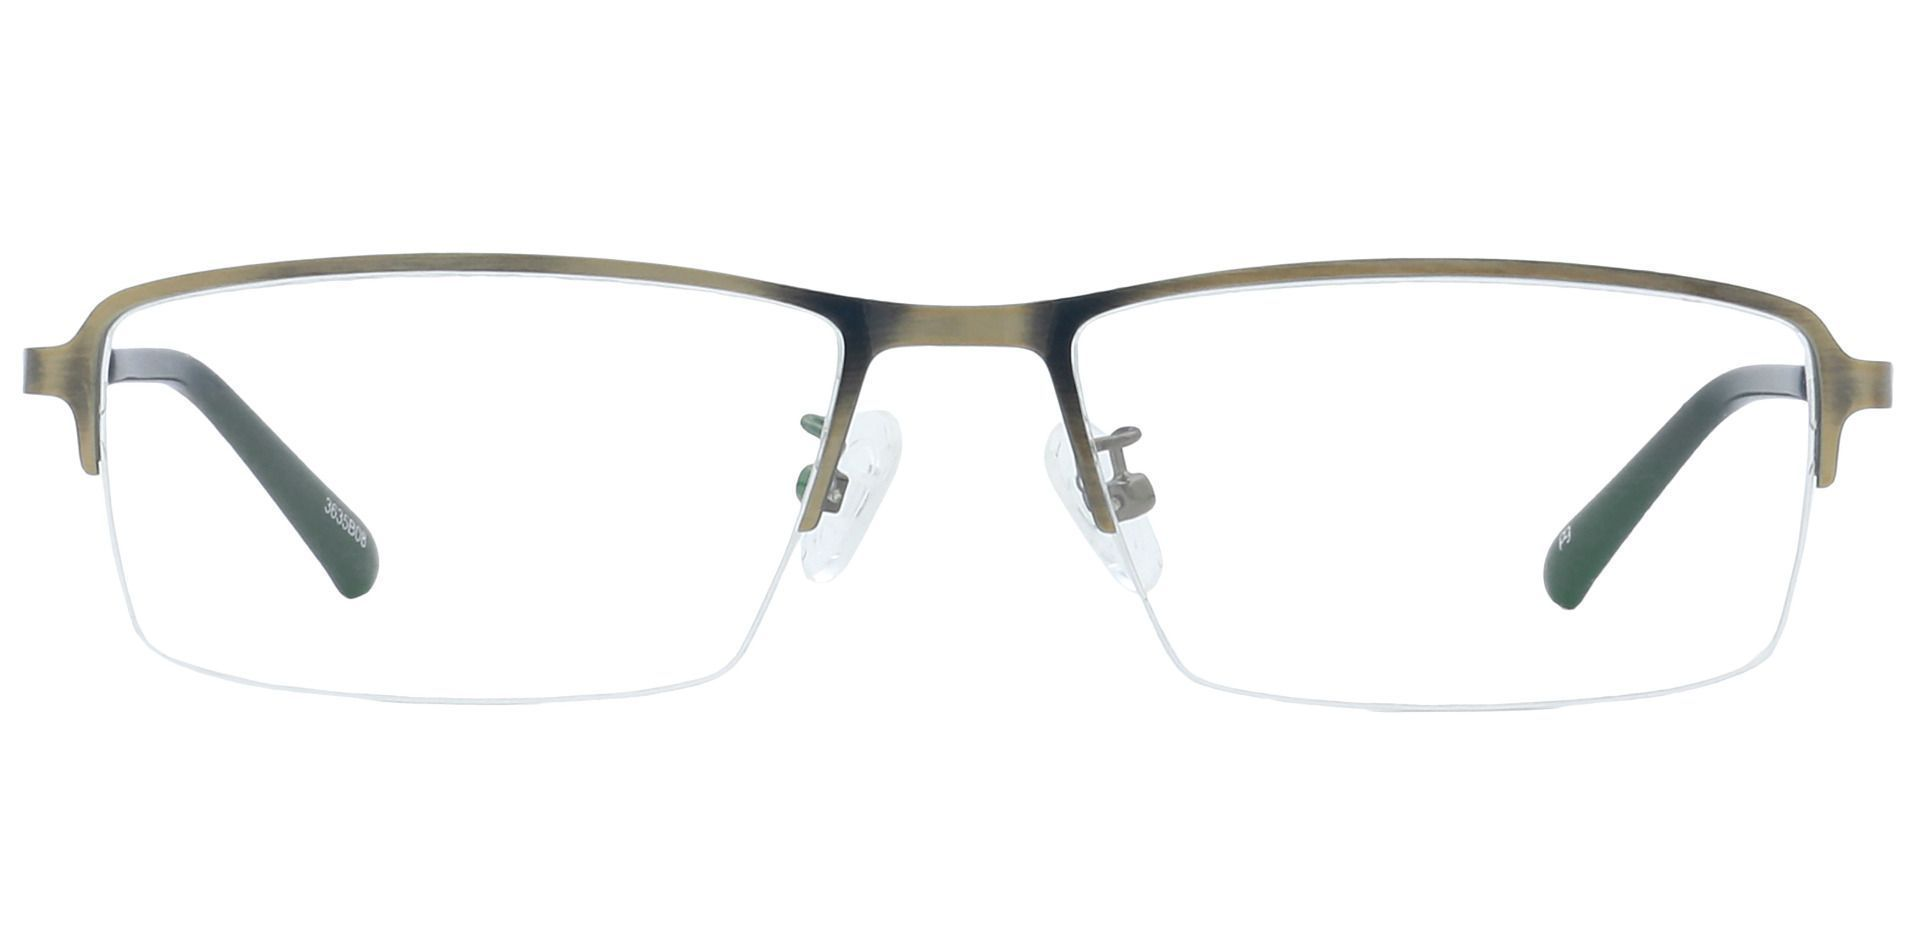 Channing Rectangle Eyeglasses Frame - Brown